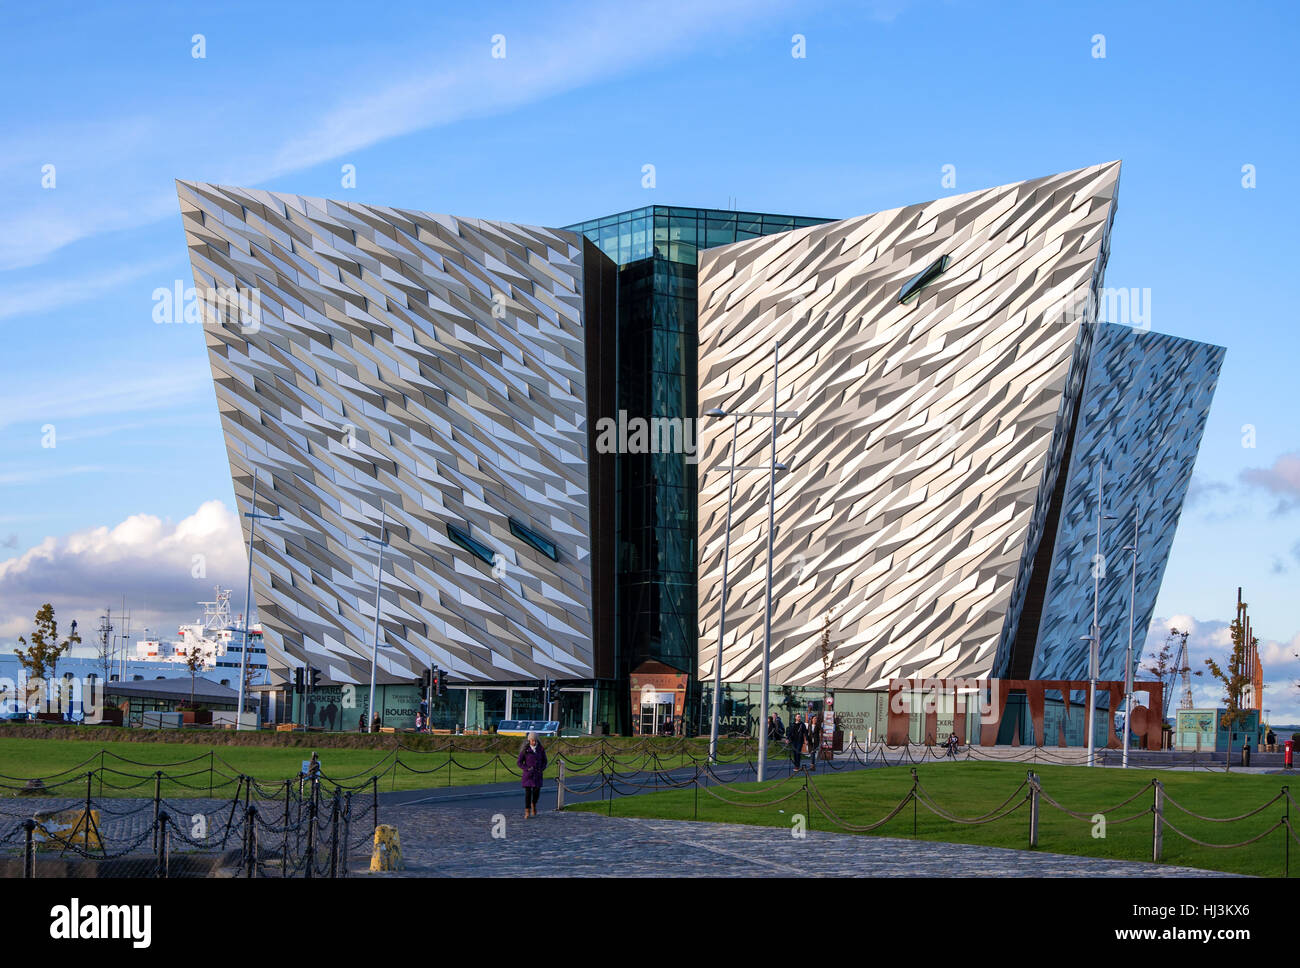 BELFAST, NORTHERN IRELAND, UK – OCTOBER 2, 2016: Titanic multimedia museum and visitors' information center in Belfast - Stock Image